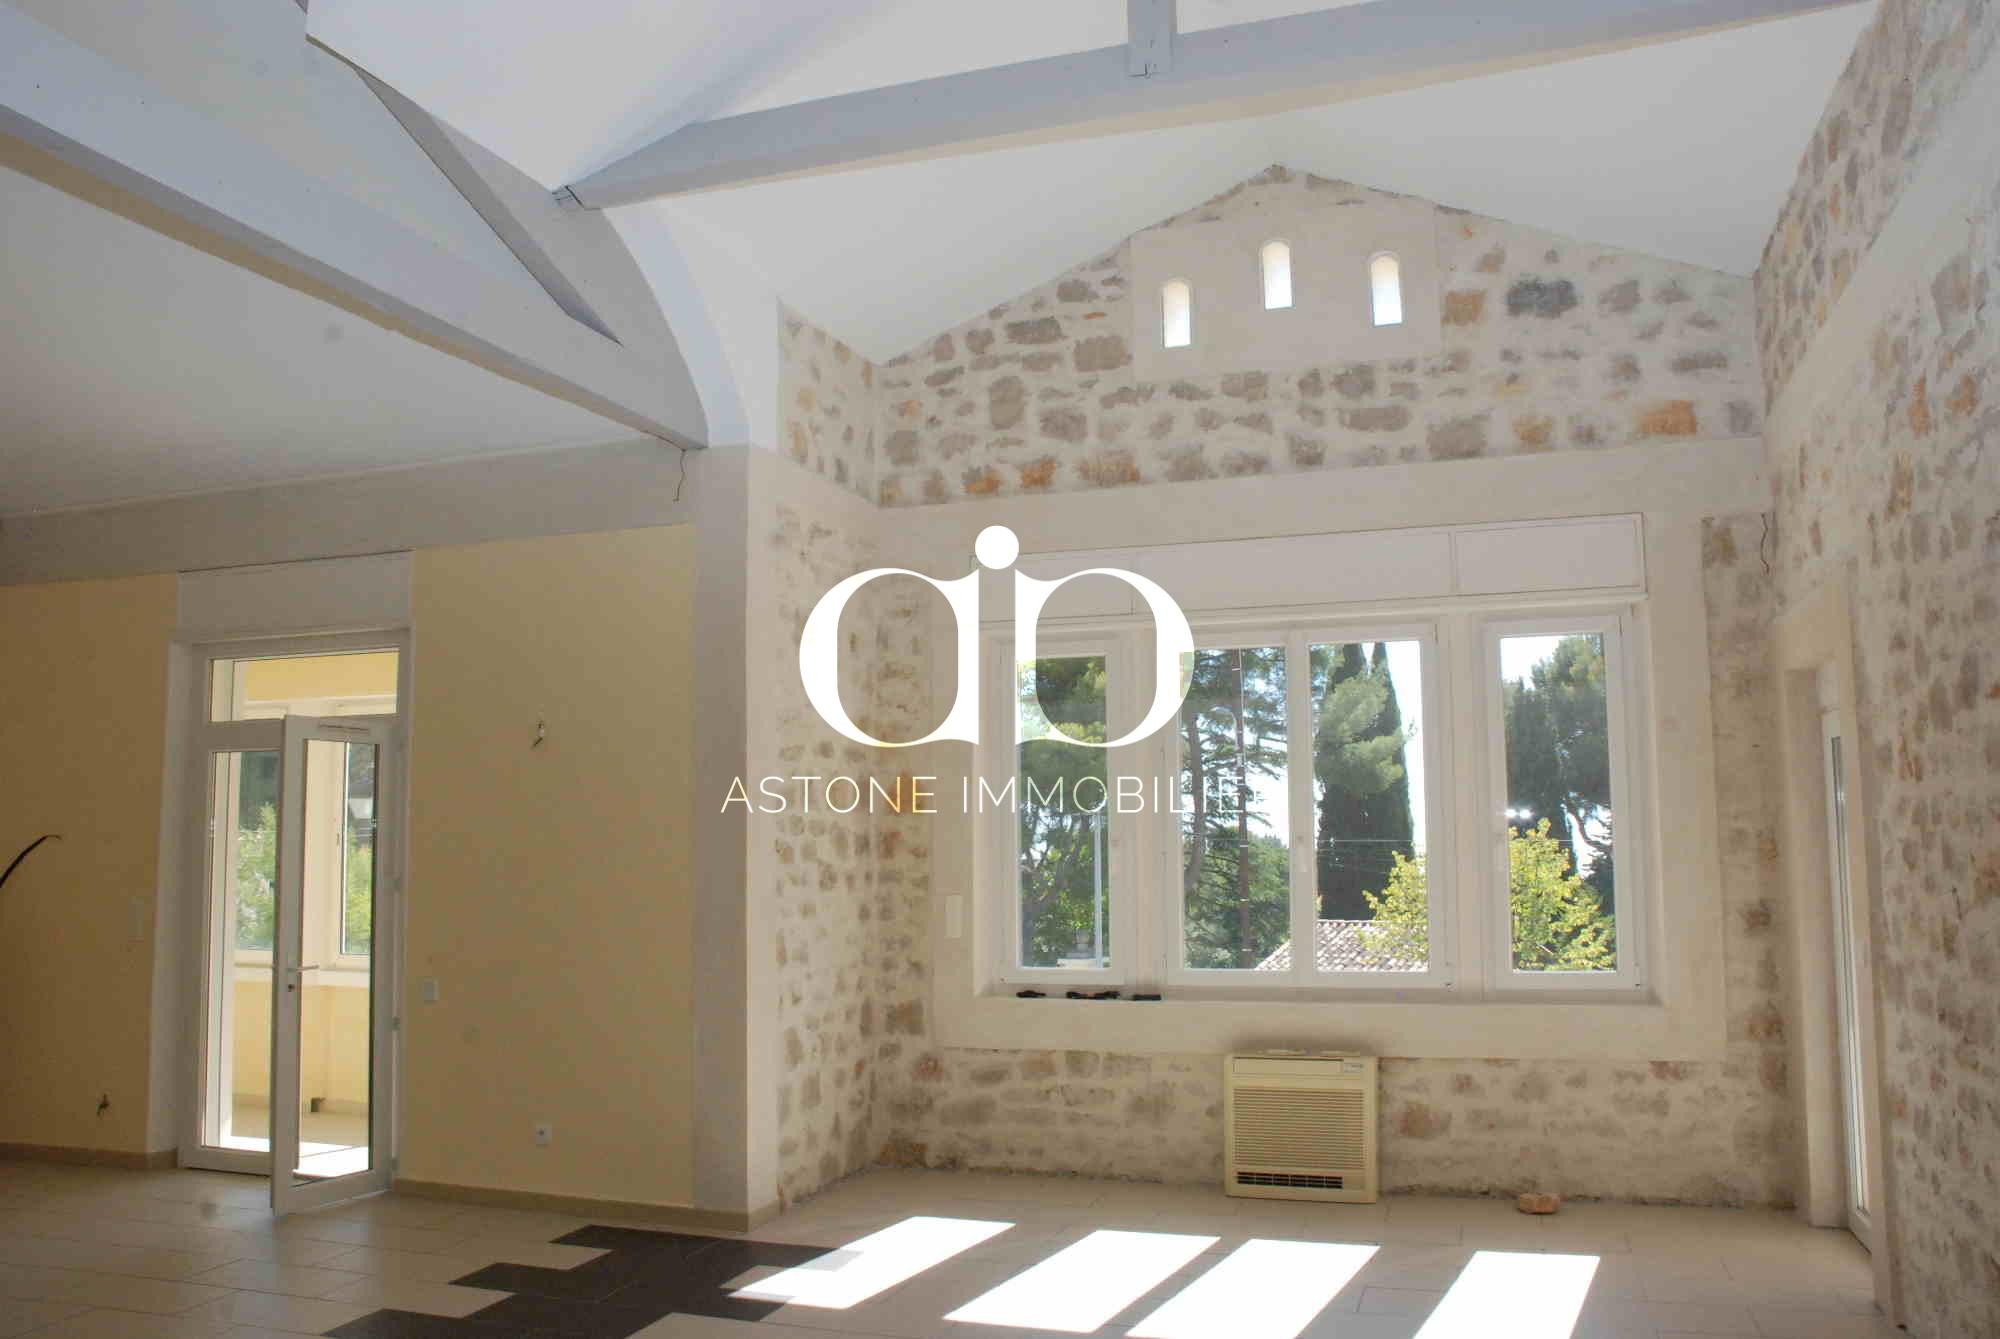 cassis maison gros potentiel a vendre astone immobilier. Black Bedroom Furniture Sets. Home Design Ideas